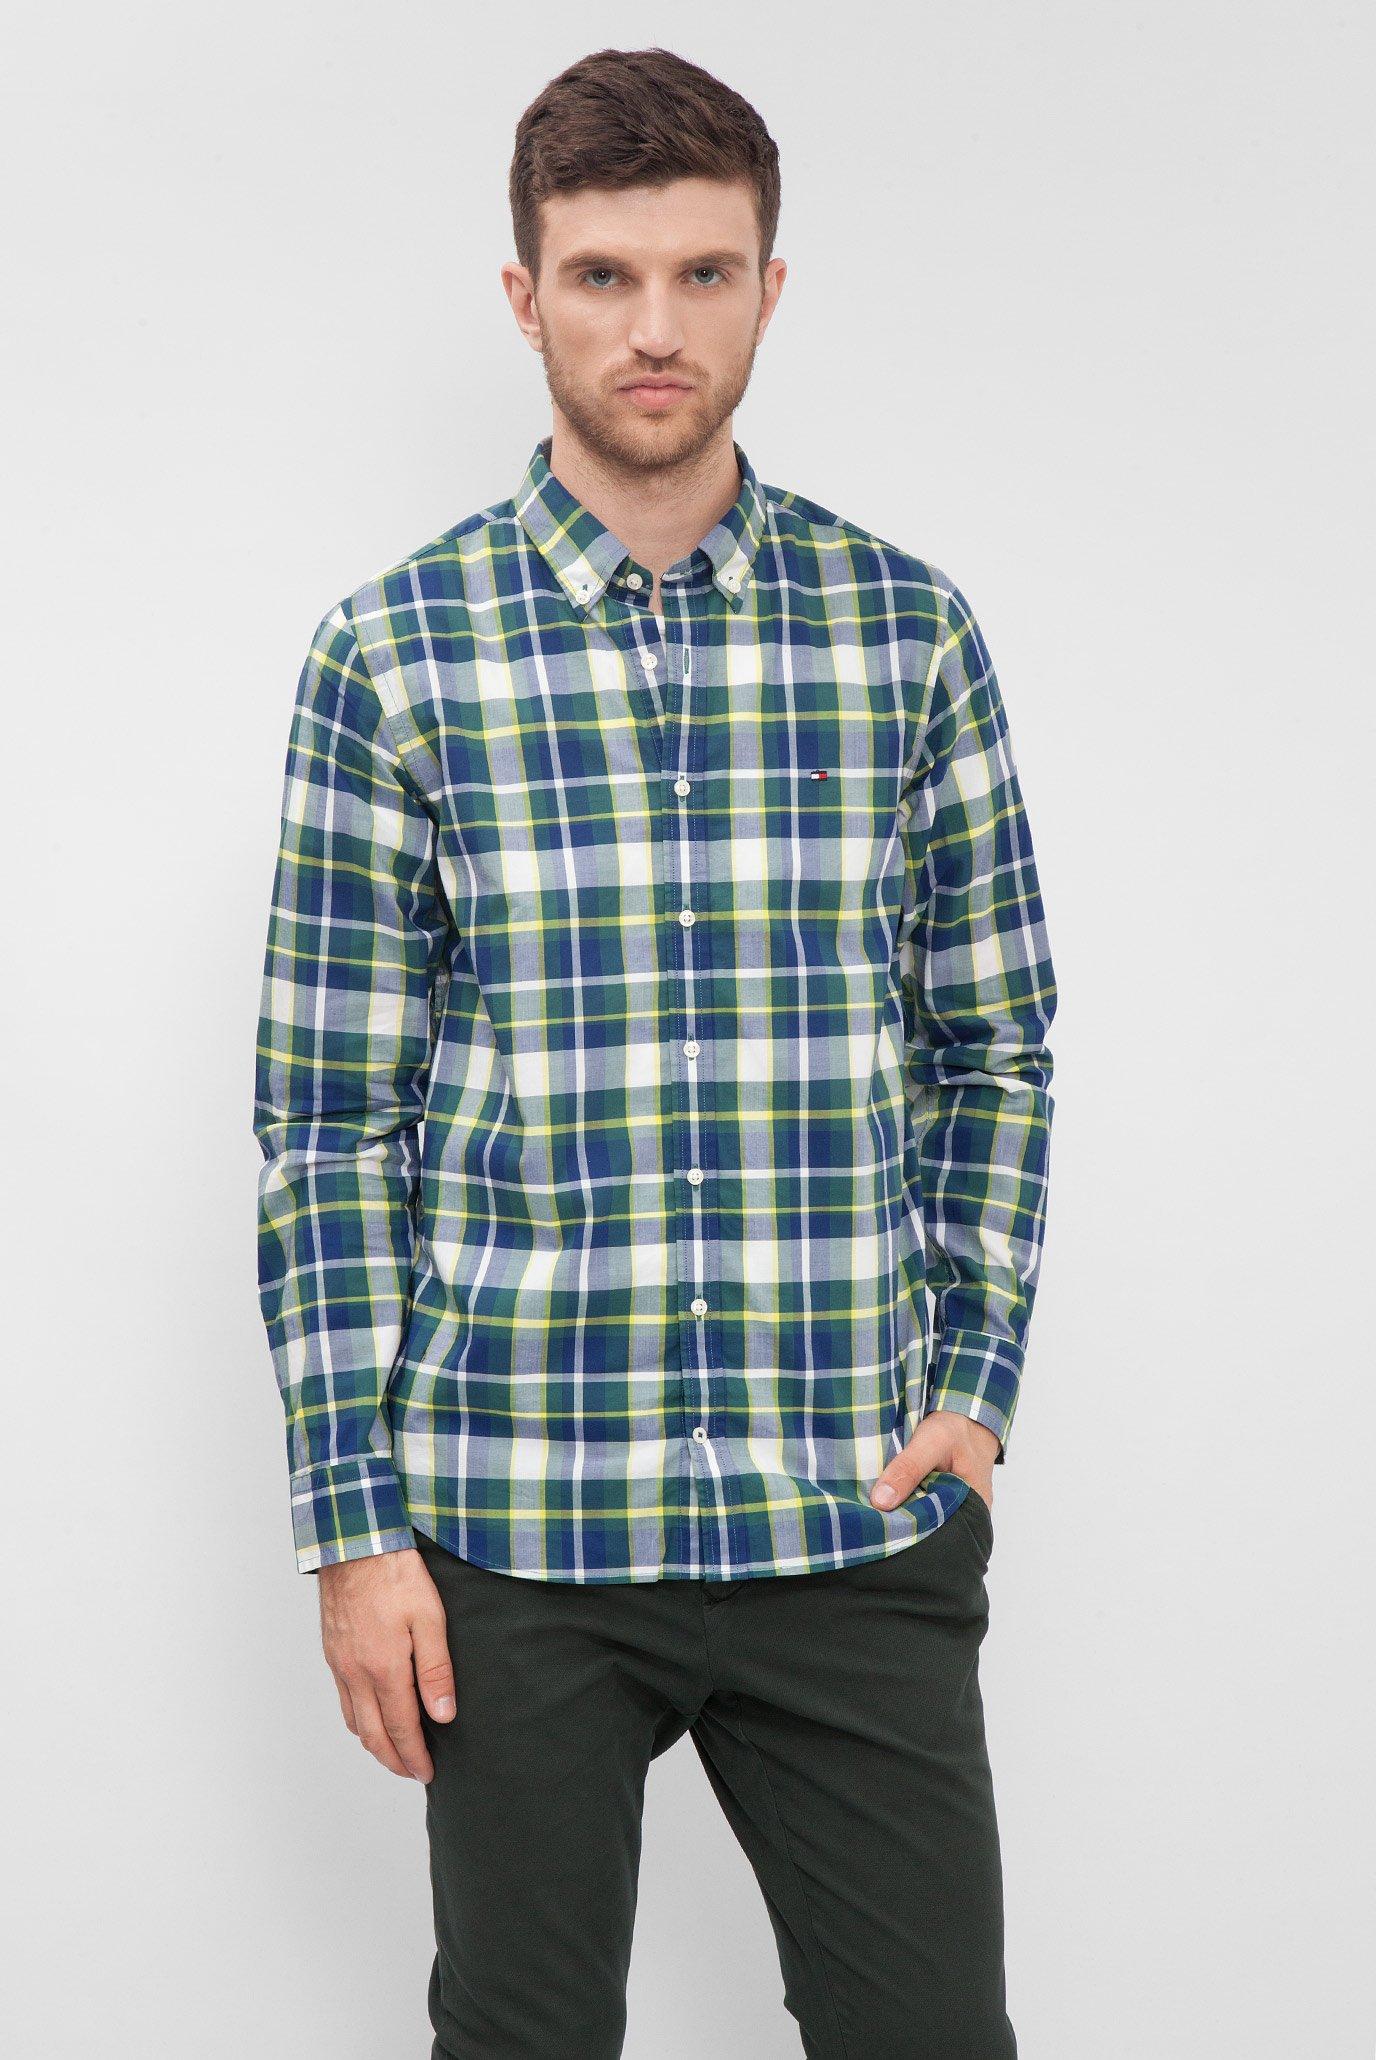 64663b711c4 Купить Мужская рубашка в клетку Tommy Hilfiger Tommy Hilfiger MW0MW02935 –  Киев